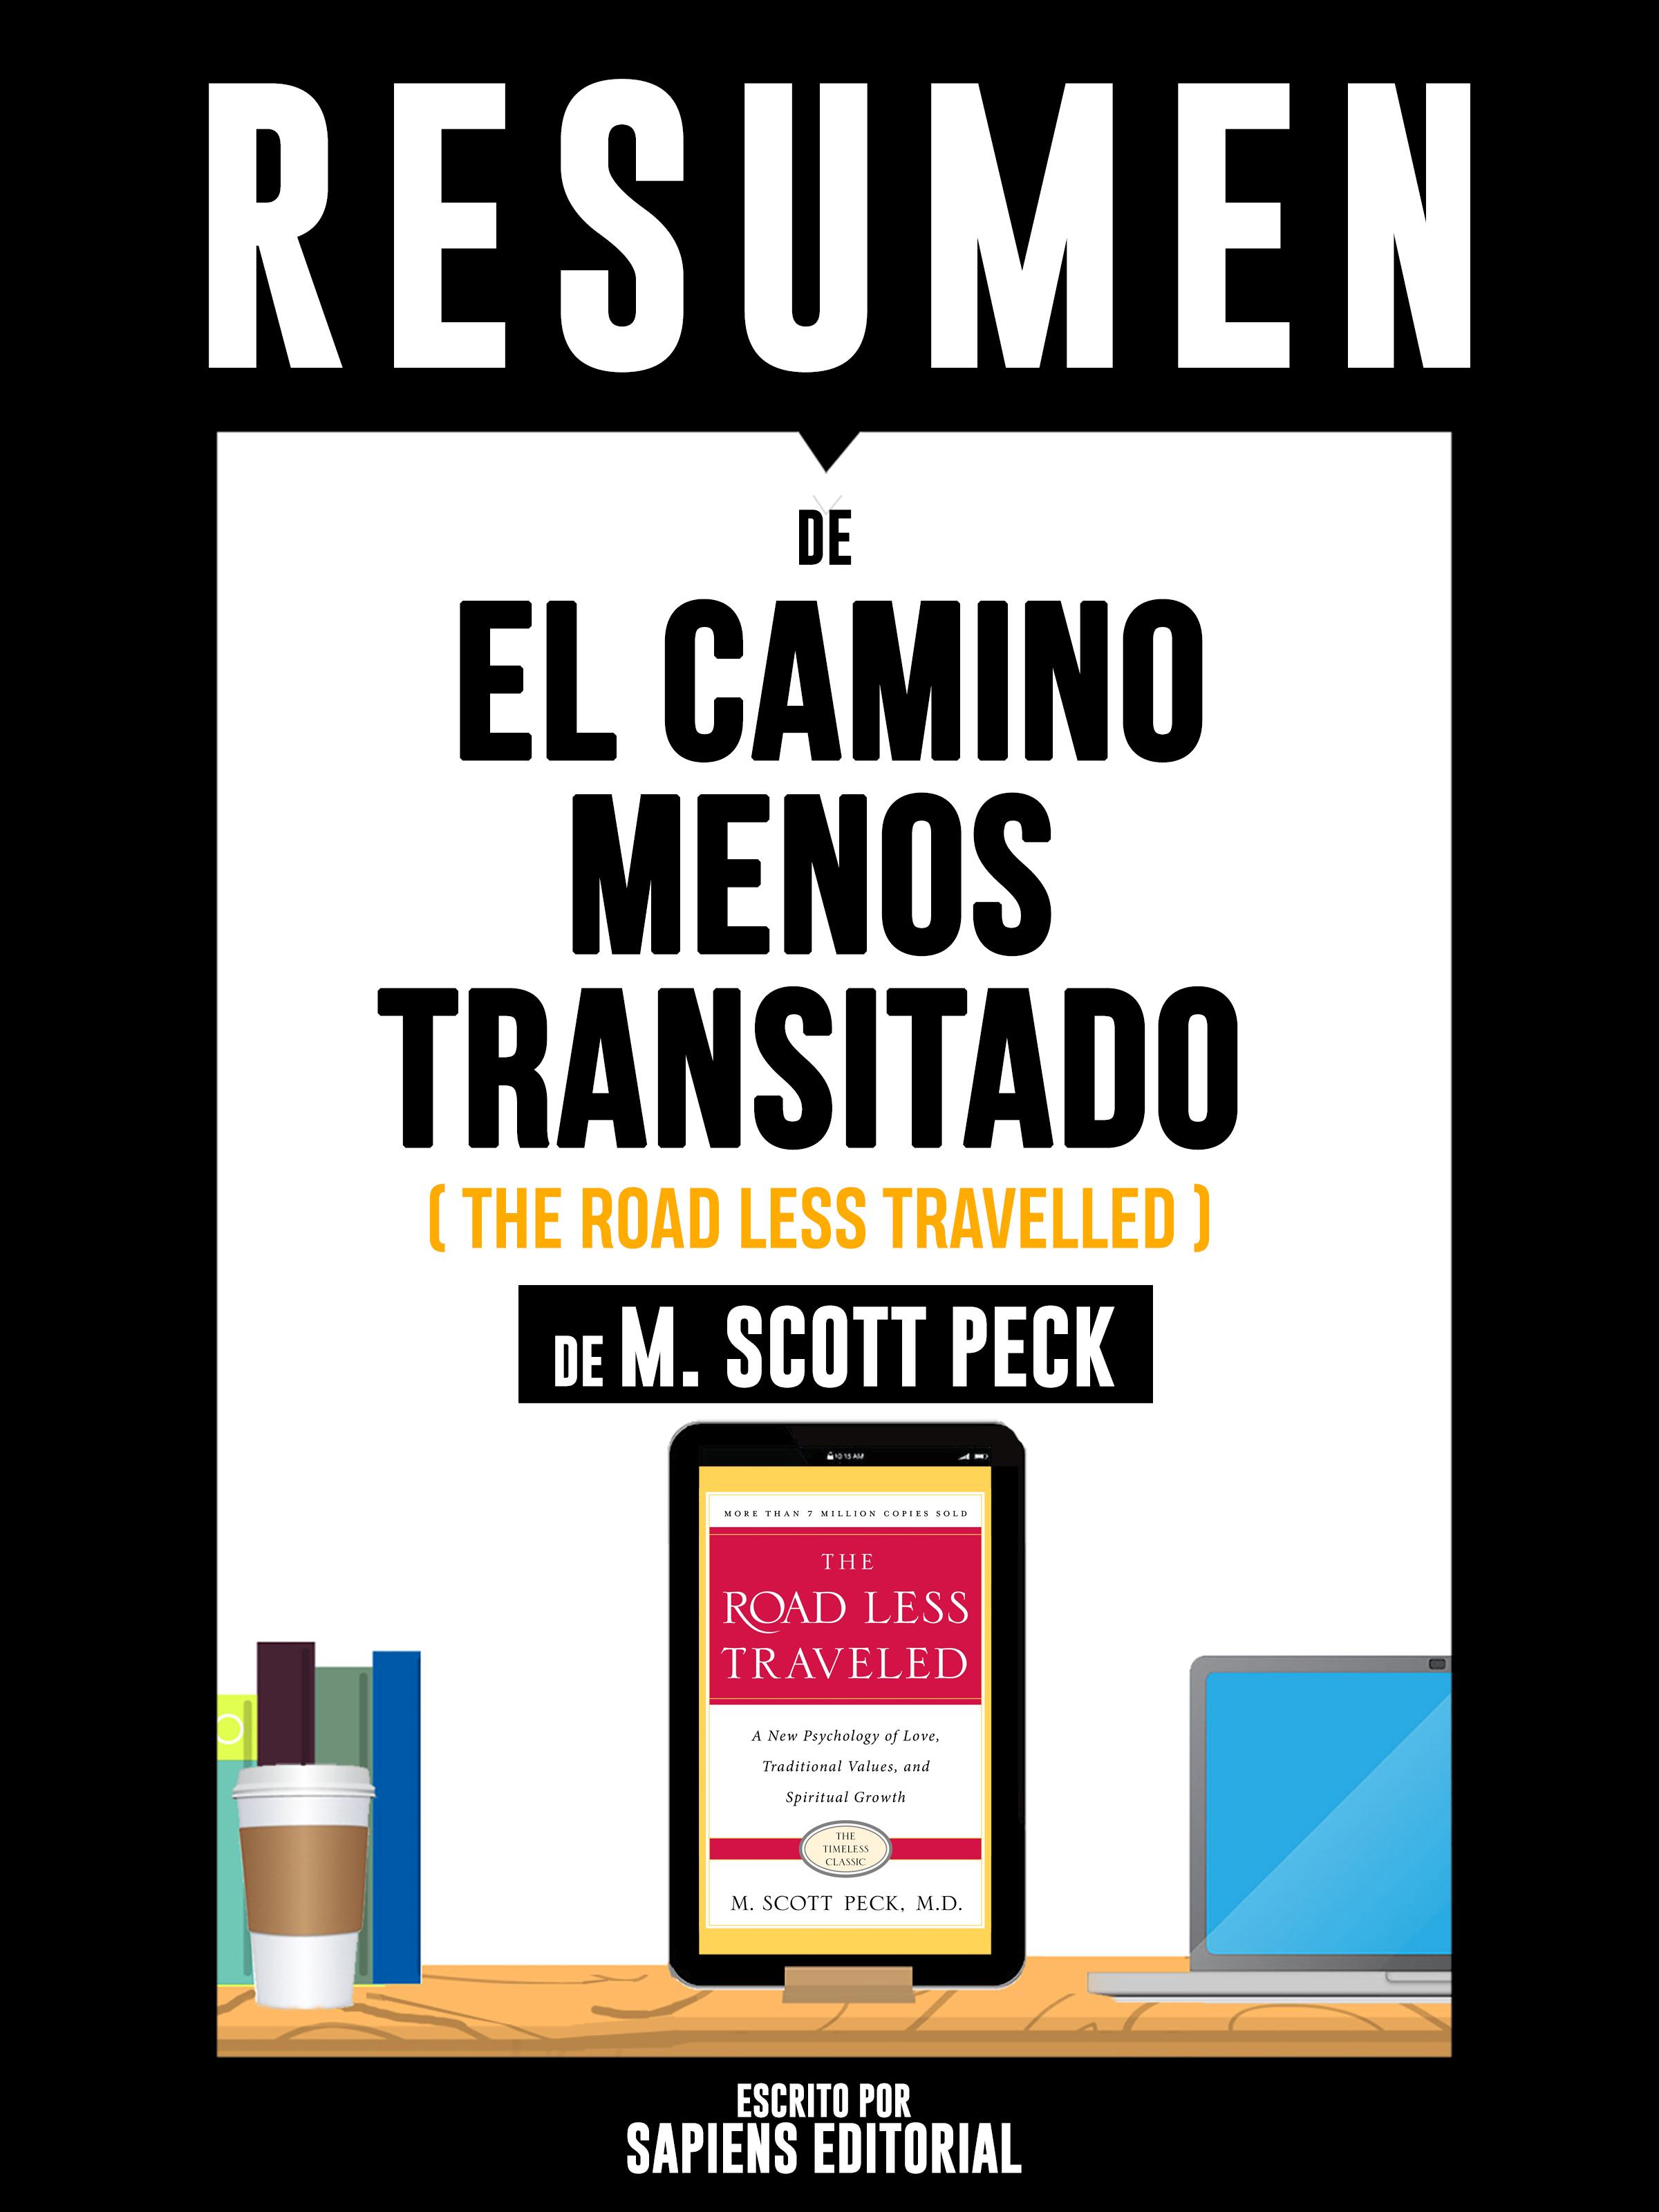 Resumen De El Camino Menos Transitado (The Road Less Travelled) - De M. Scott Peck